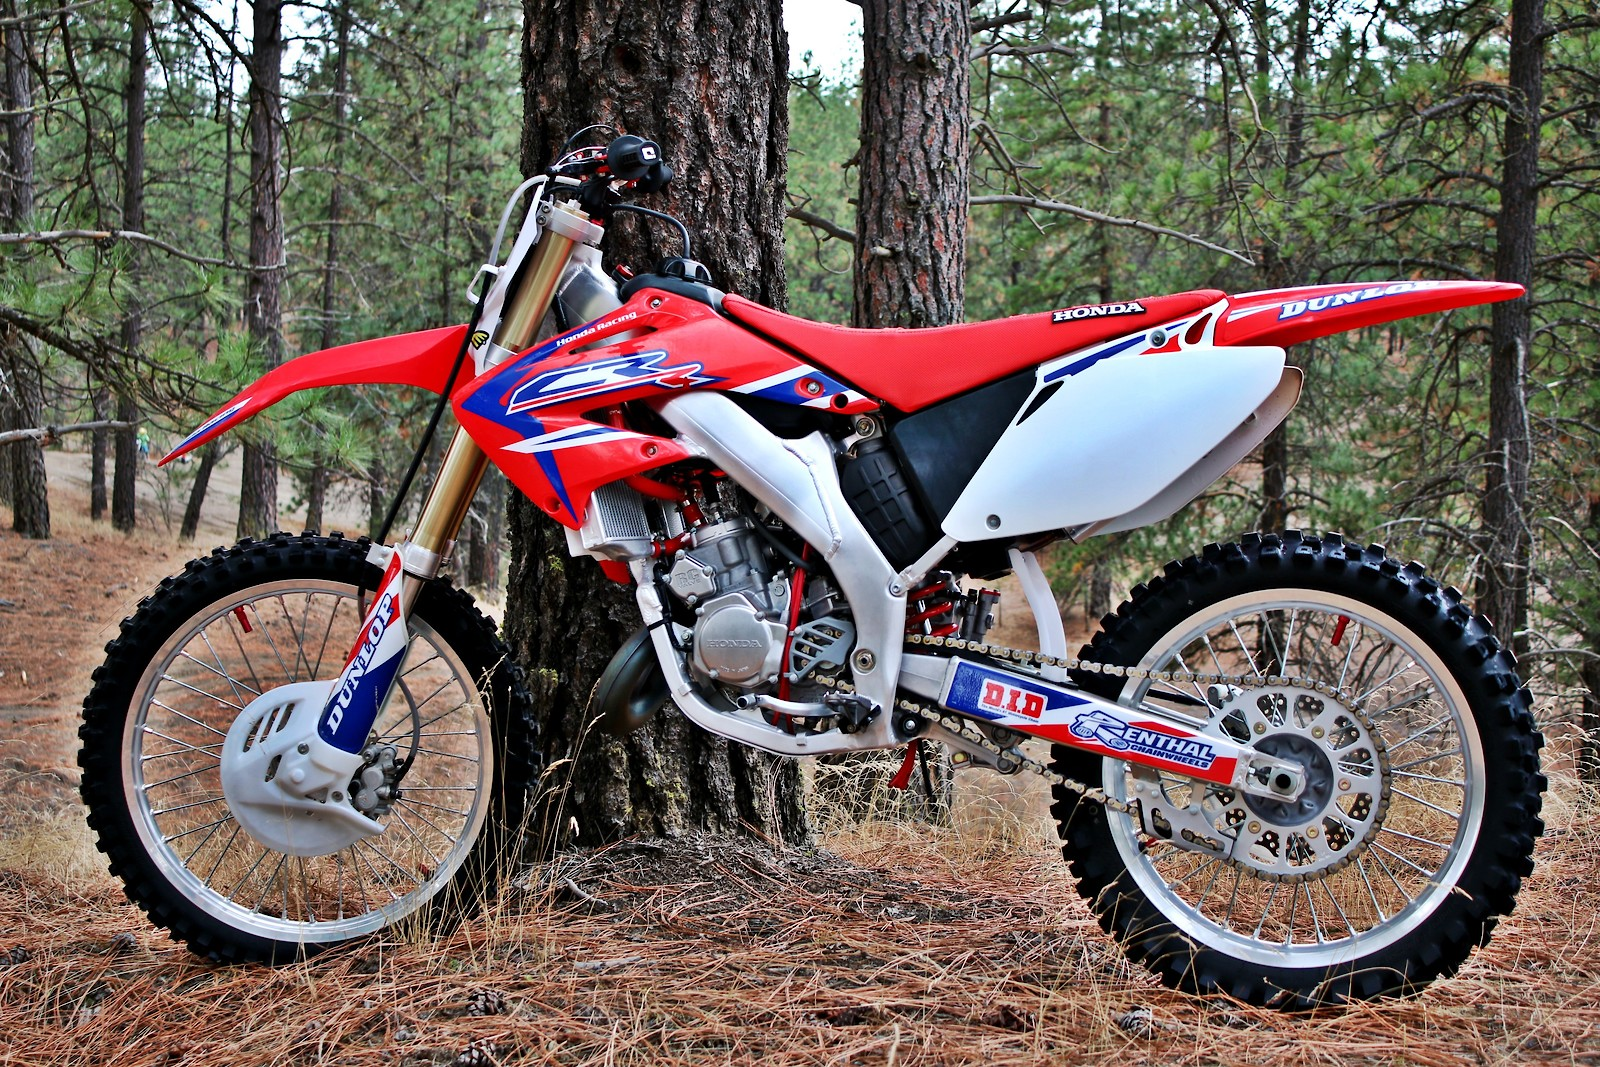 2005 CR125 - Cameron Niemela - Motocross Pictures - Vital MX